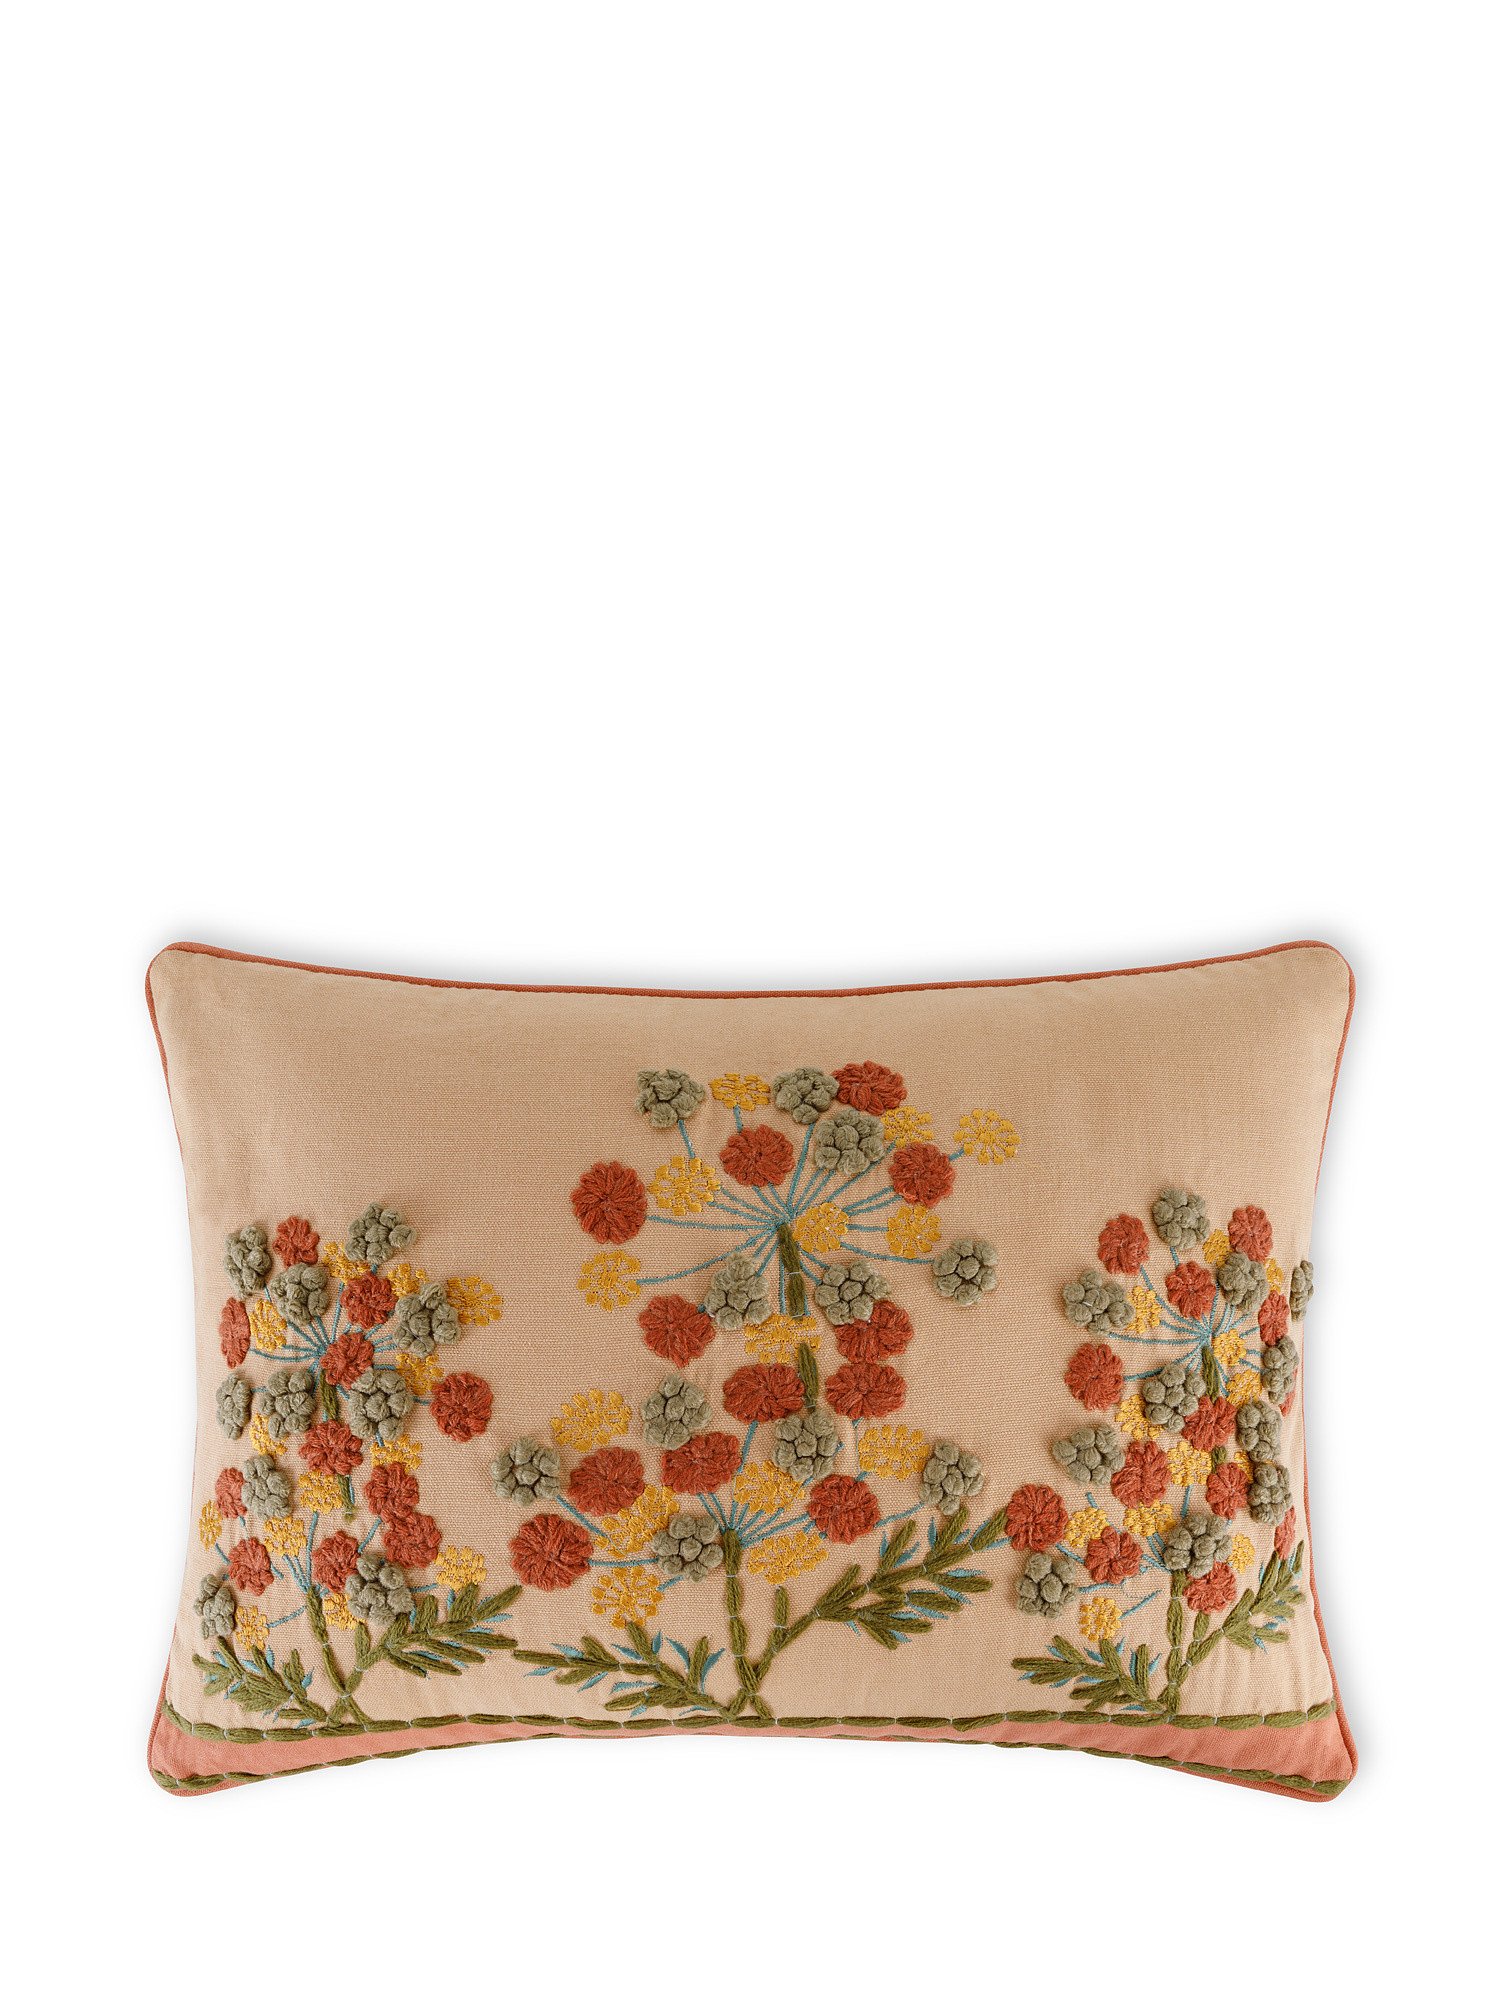 Cuscino cotone ricamo floreale 35x50cm, Multicolor, large image number 0